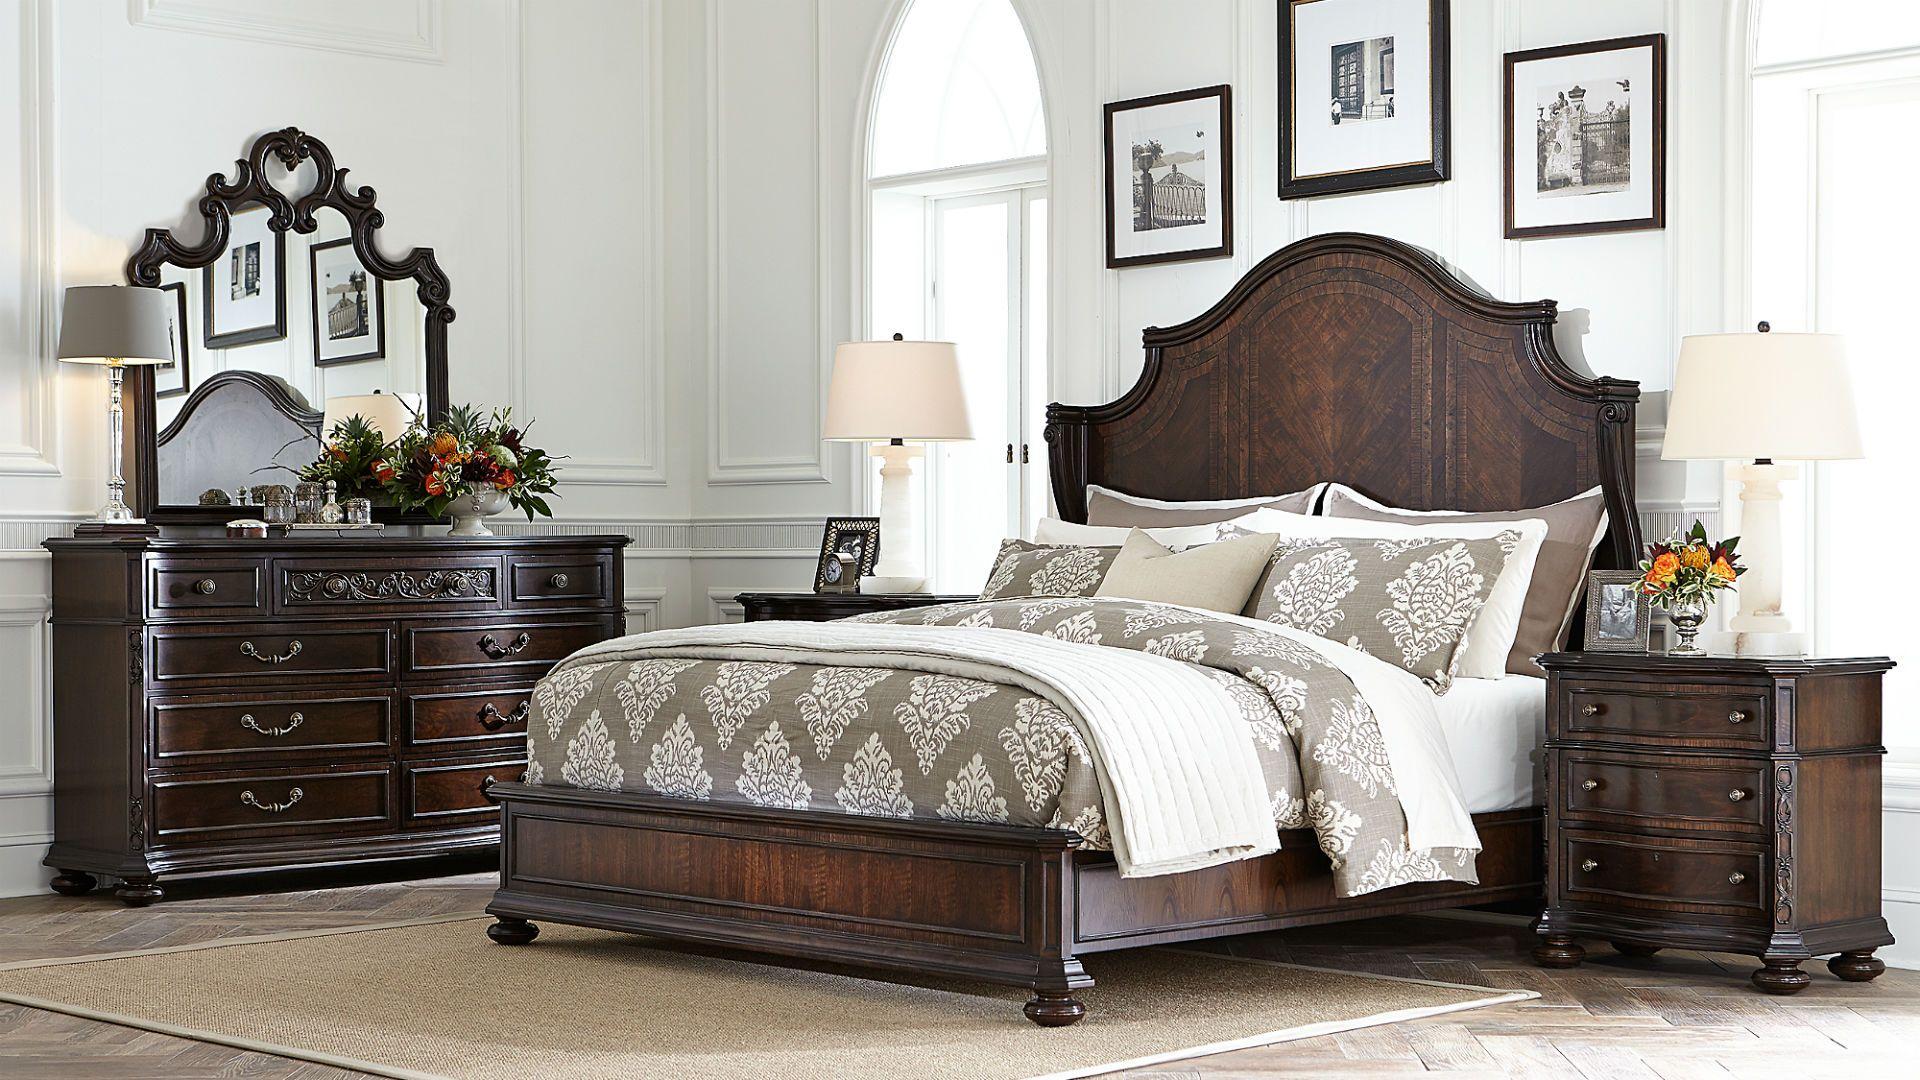 Casa donore bedroom stanley furniture